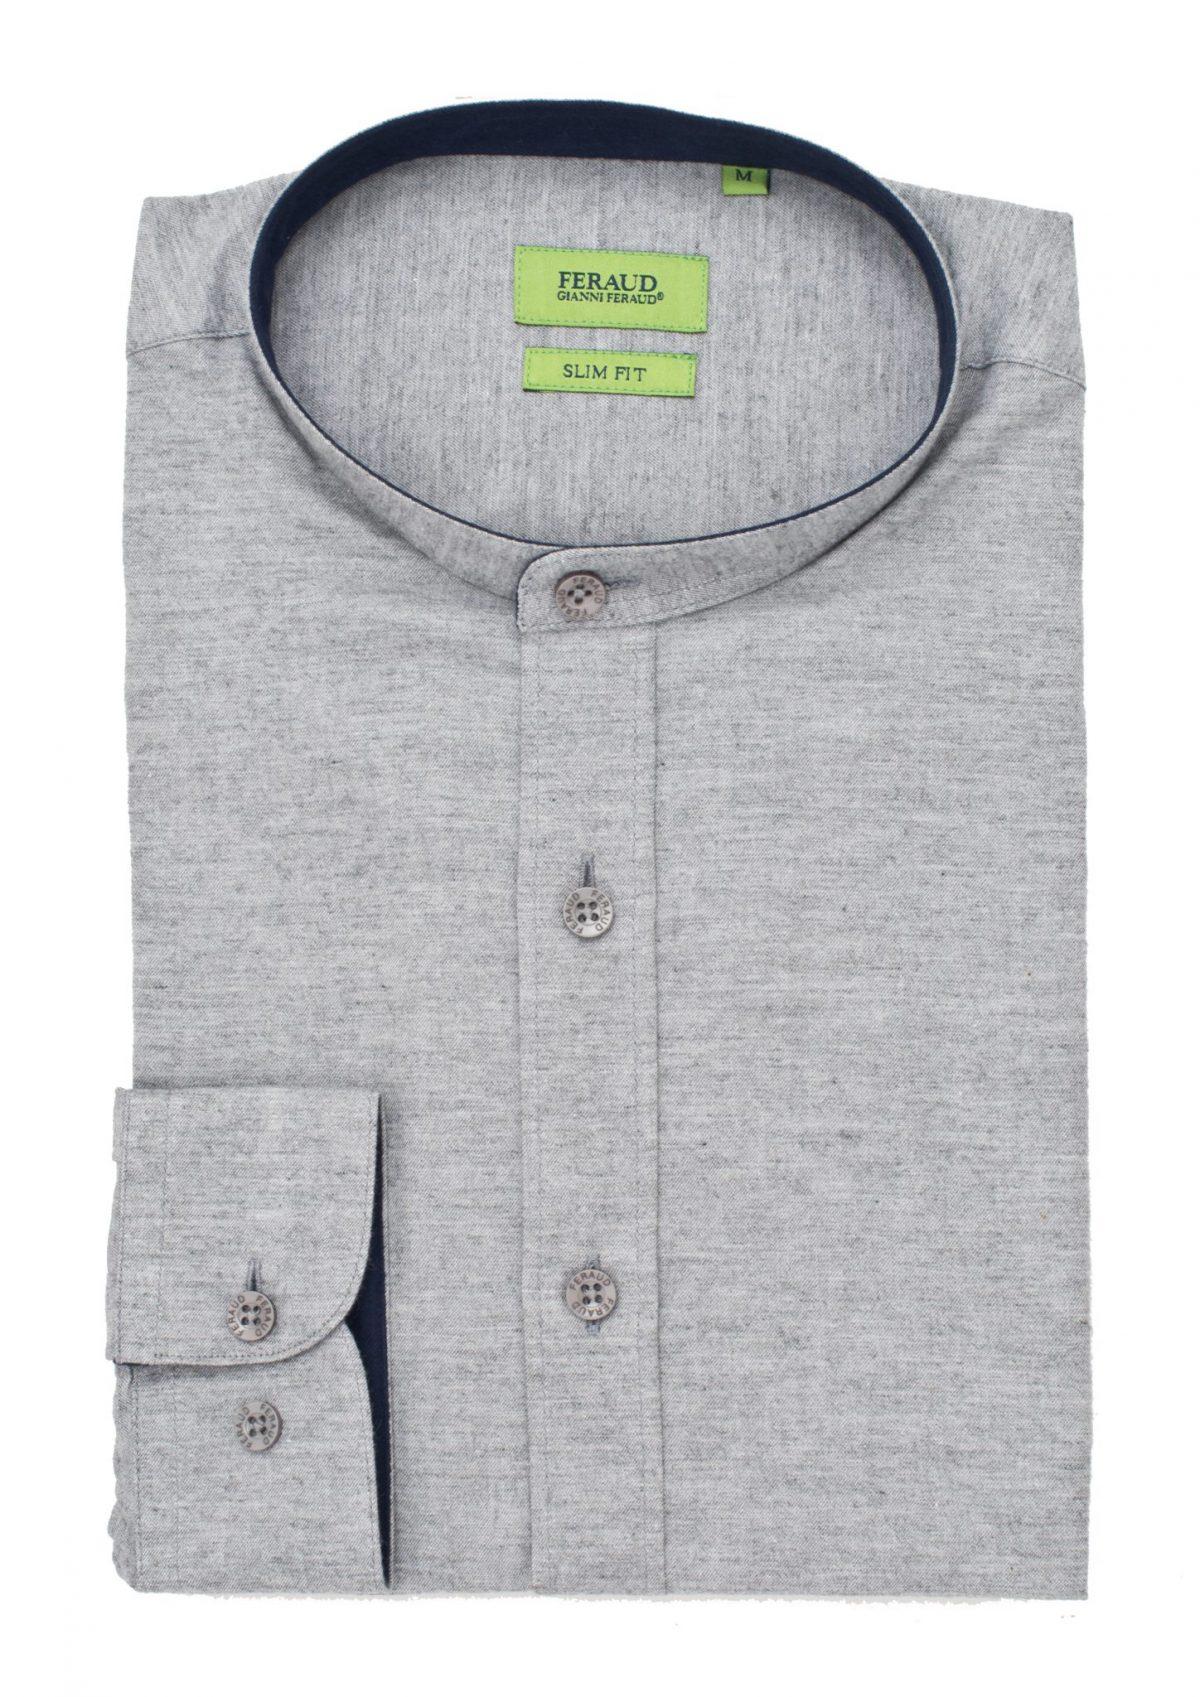 Shirt7